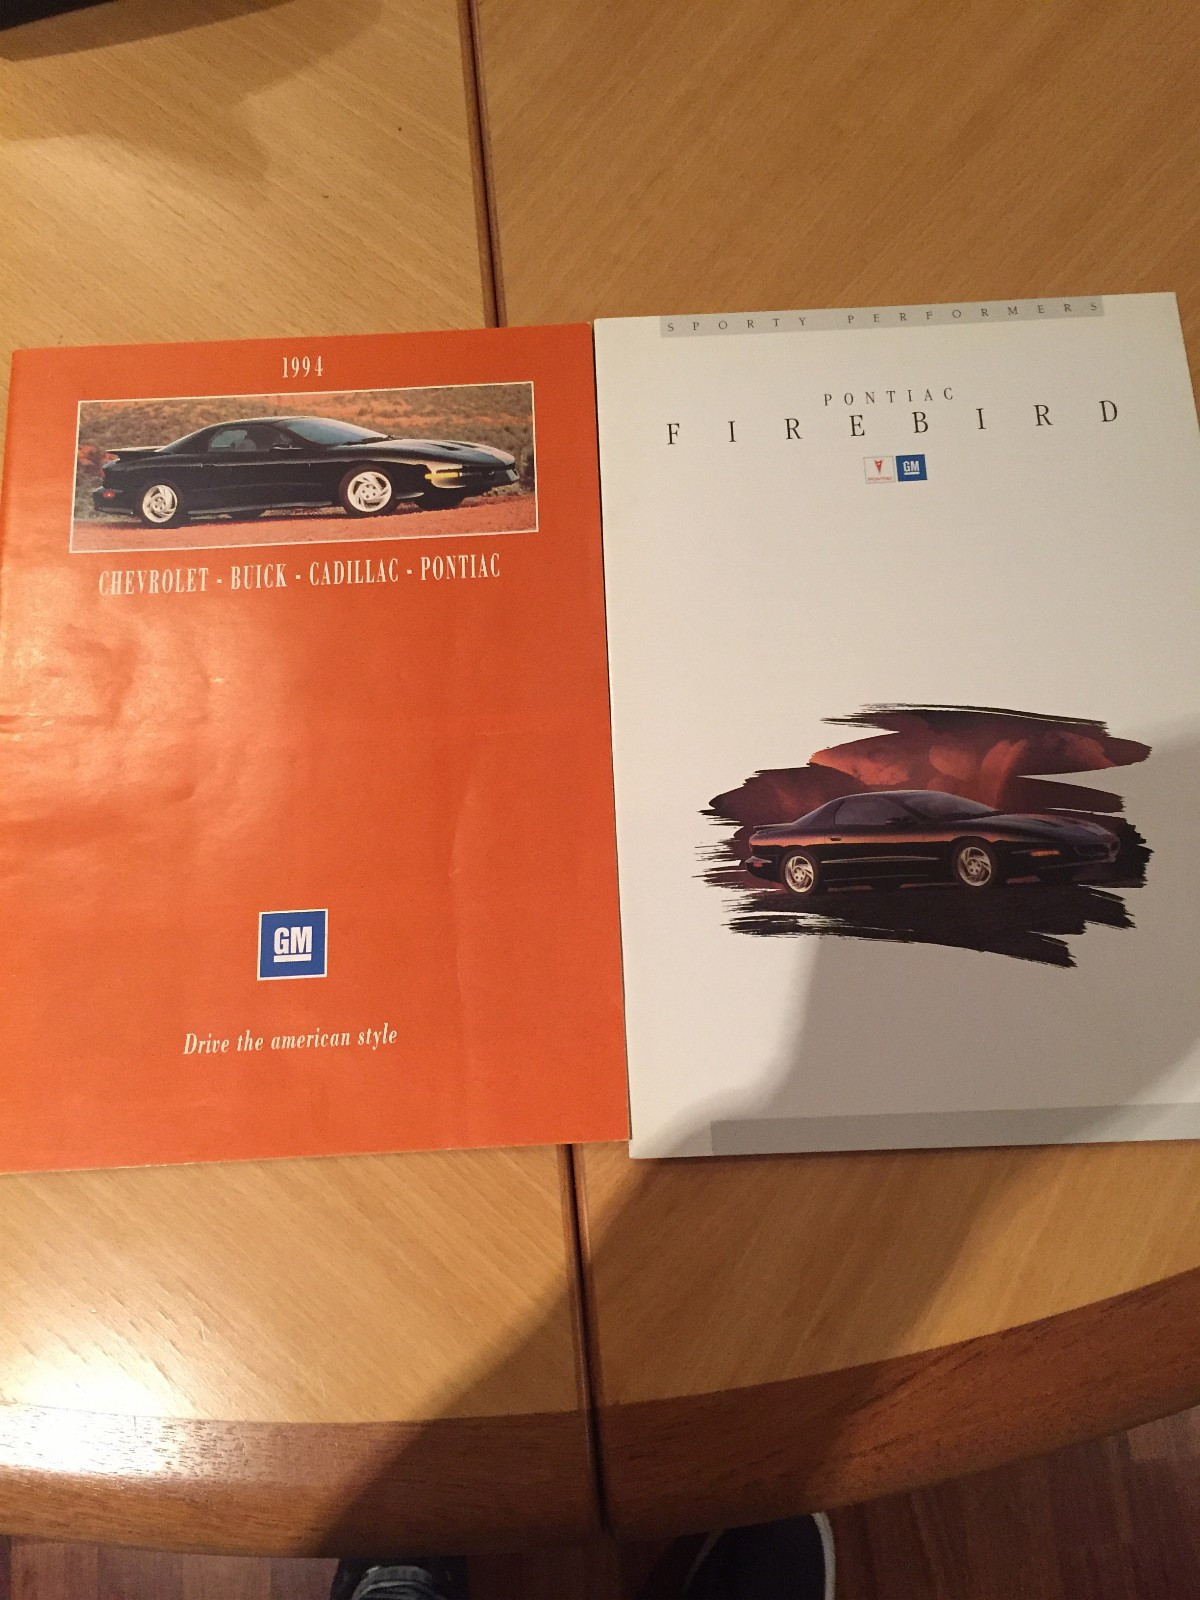 1994 Pontiac Firebird Bilbrosjyre - Oslo  - 1994 Pontiac Trans Am/ Firebird kr.200.- 1994 GM Samlebrosjyre Norsk kr.200.- - Oslo